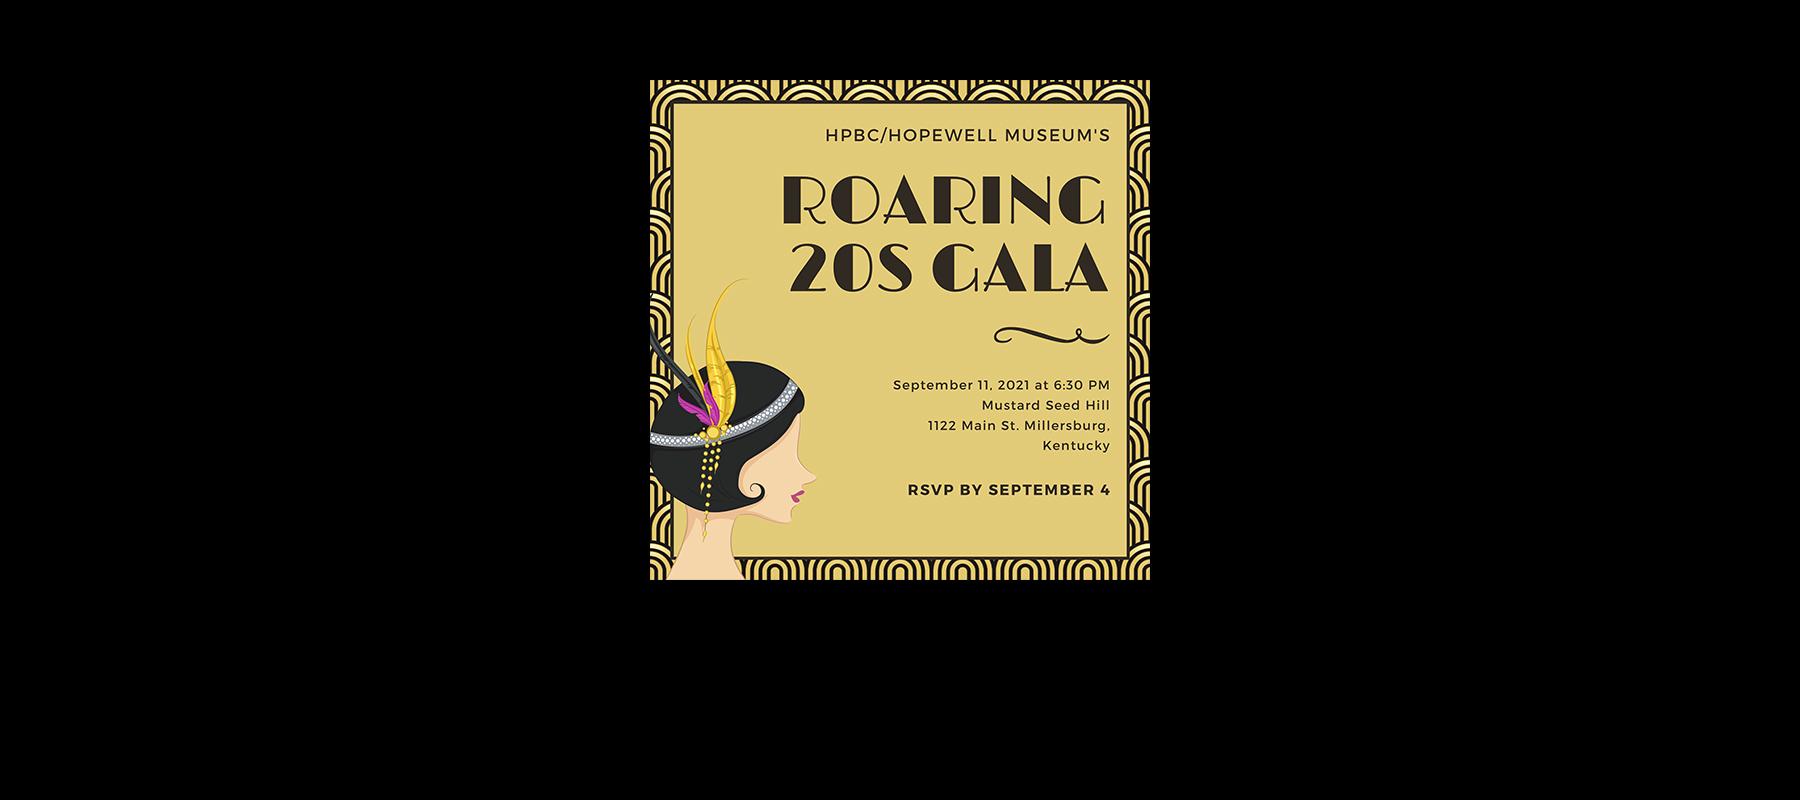 HPBC/Hopewell Museum Roaring 20s Gala September 11, 2021 at 6:30 p.m. Mustard Seed Hill 1122 Main Street Millersburg Kentucky RSVP by Septmeber 4